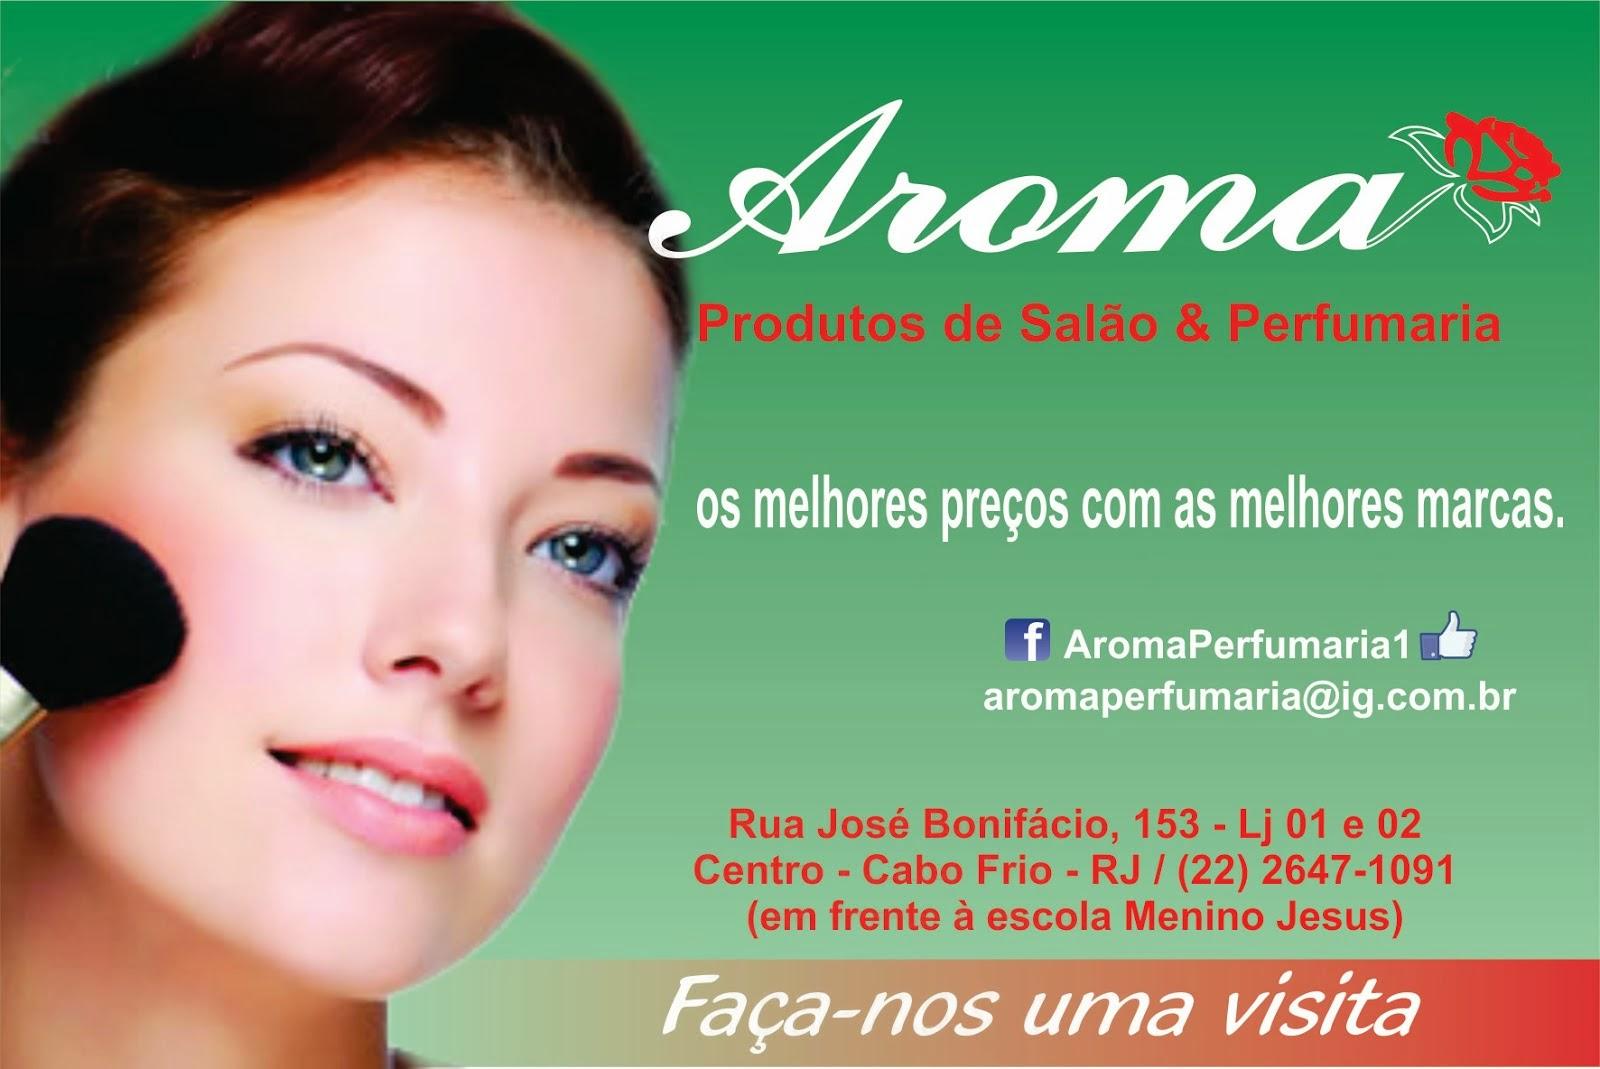 Aroma Perfumaria